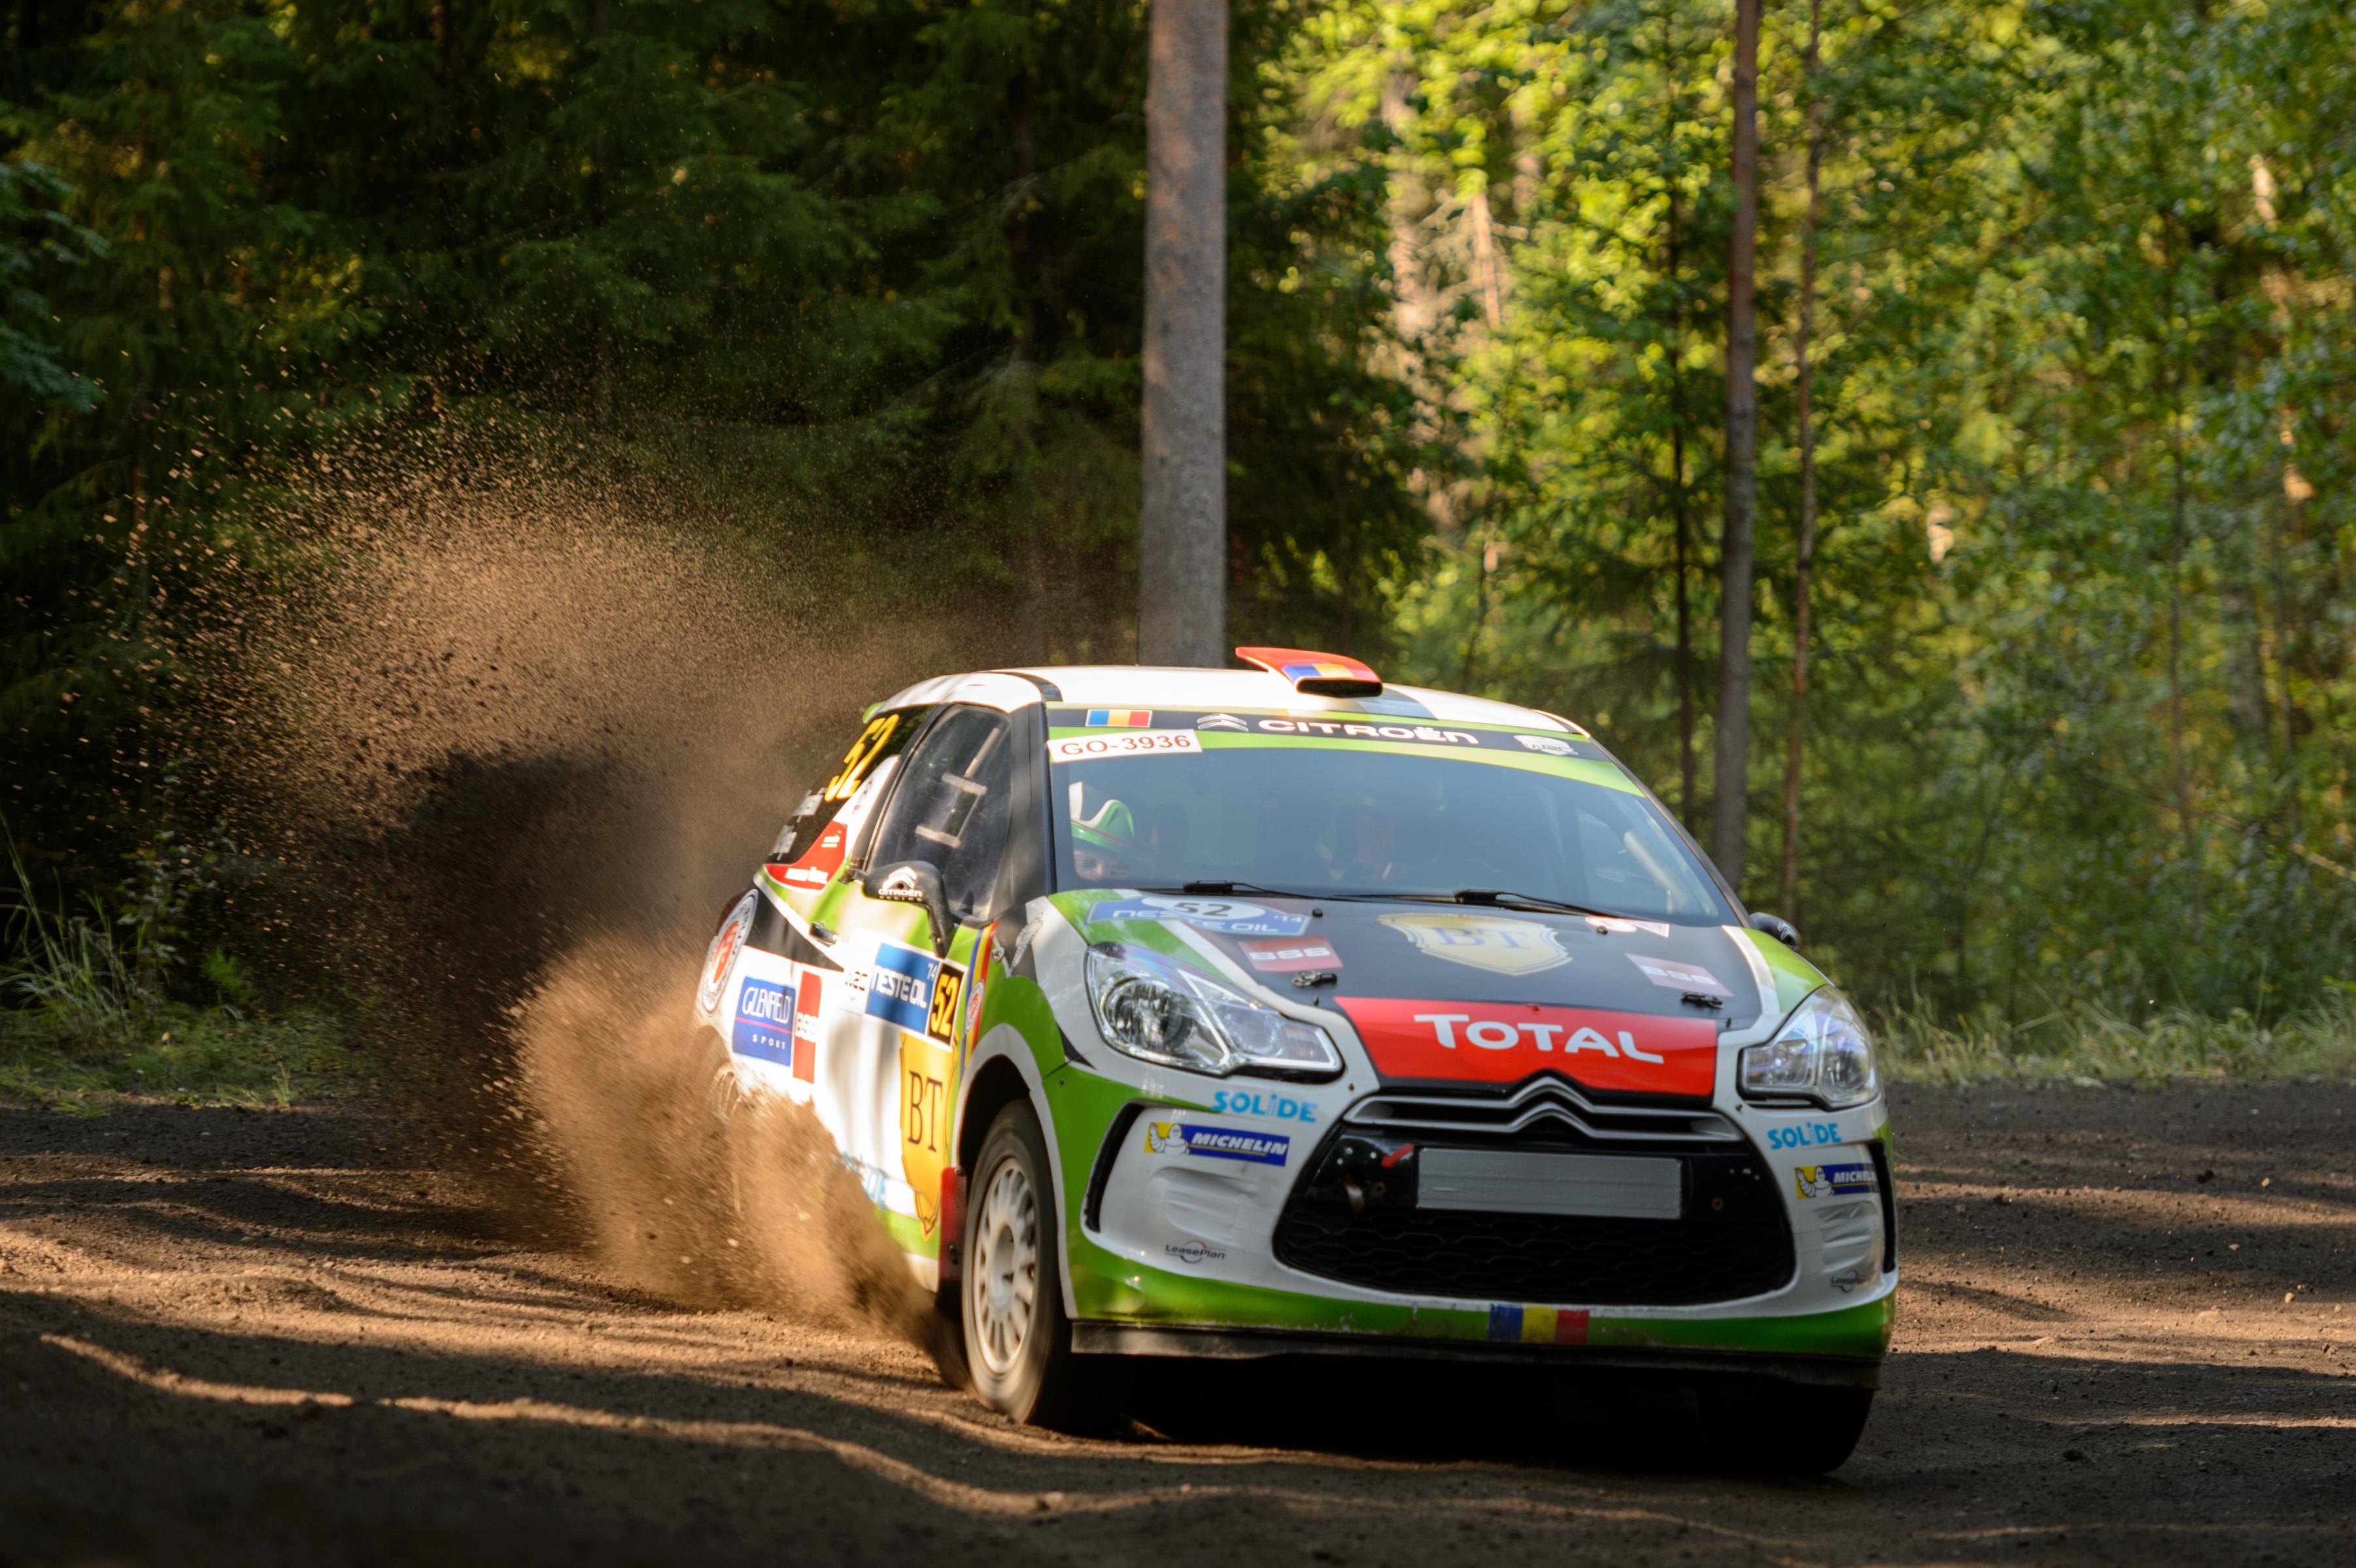 Simone Tempestini încheie campania din Junior WRC cu Raliul Marii Britanii